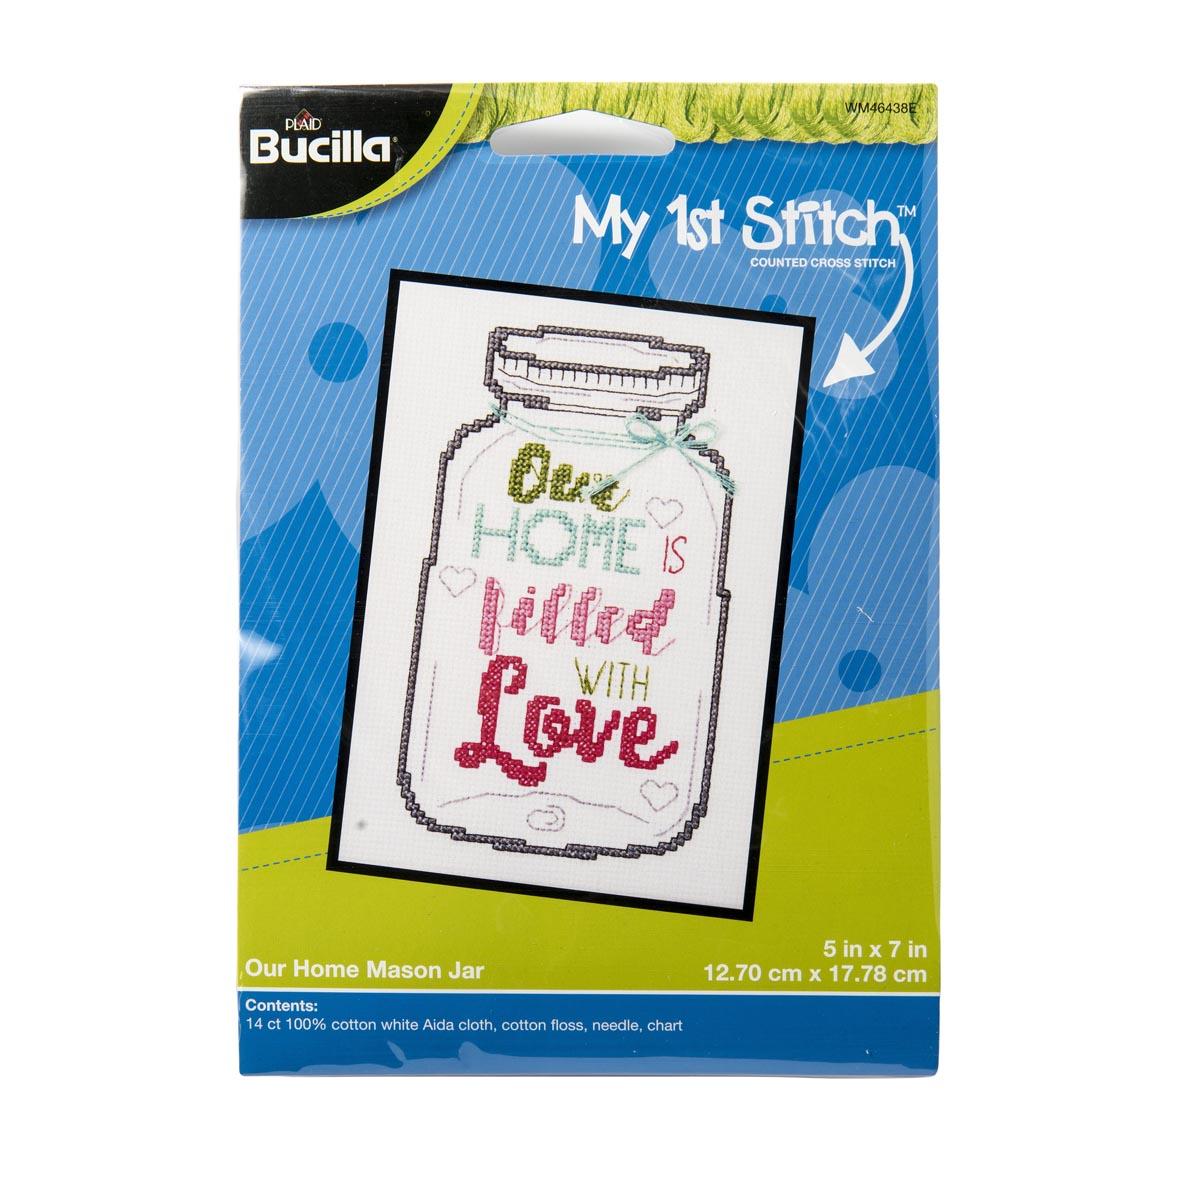 Bucilla ® My 1st Stitch™ - Counted Cross Stitch Kits - Our Home Mason Jar